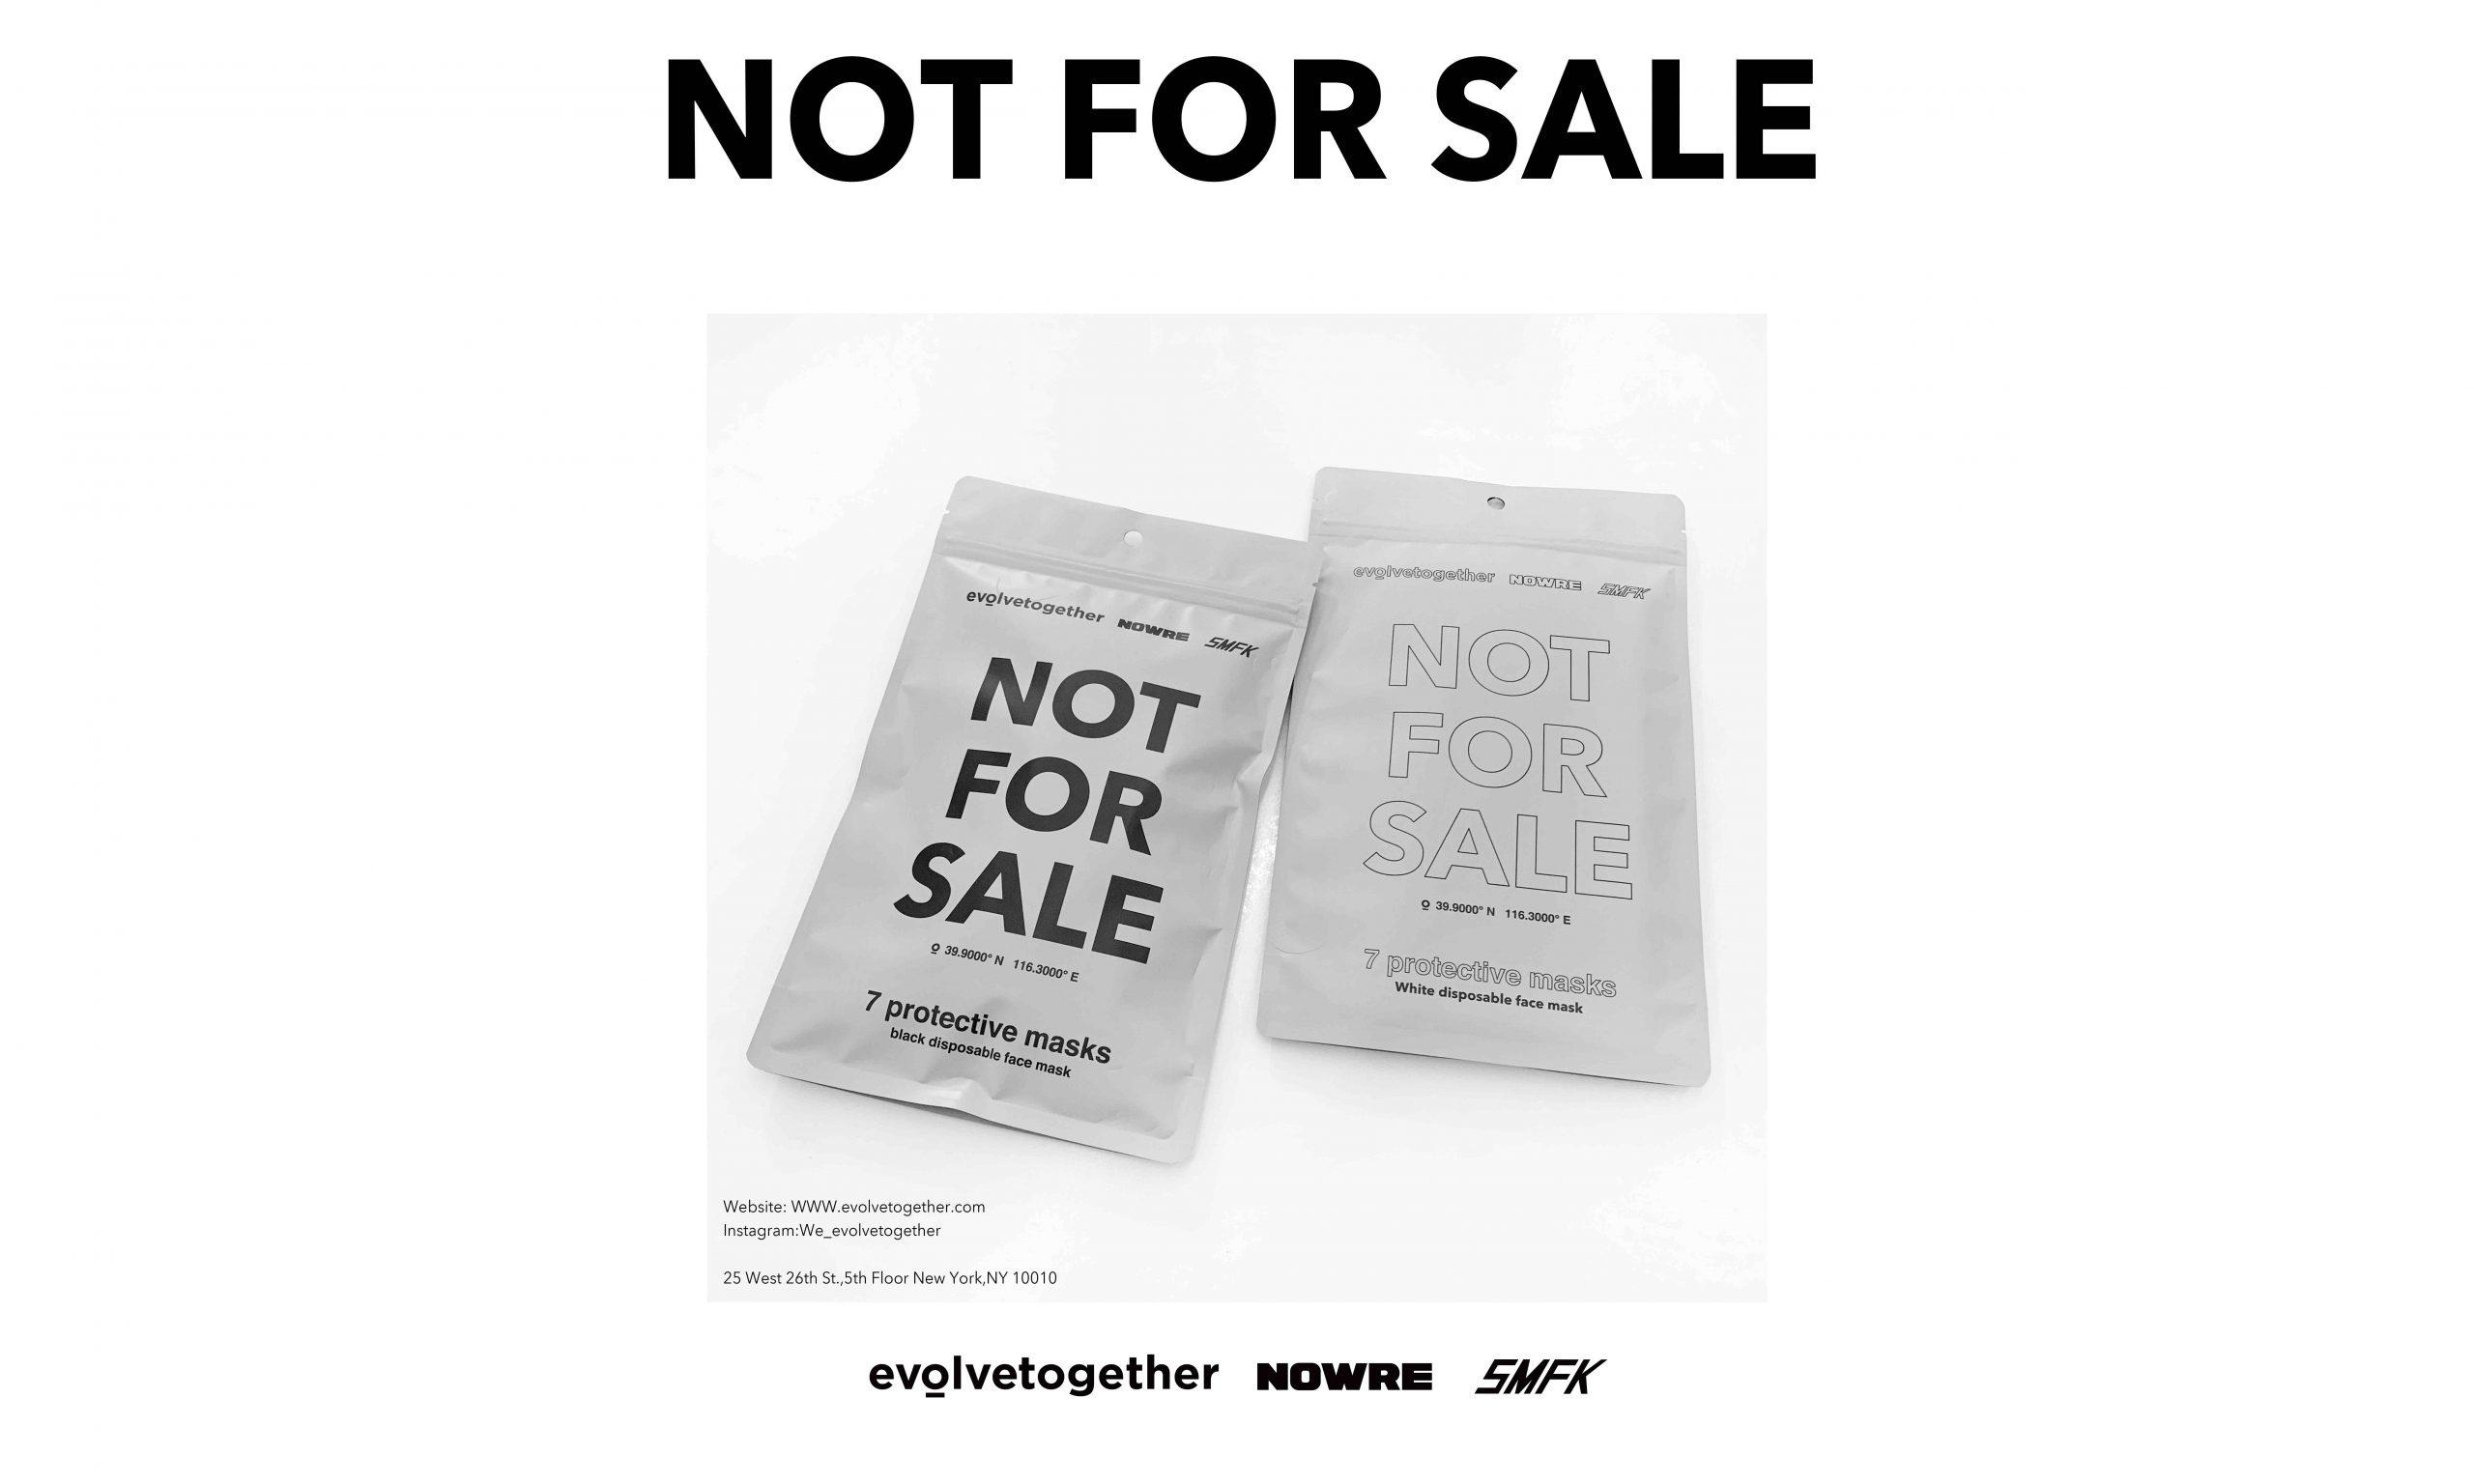 SMFK 联合 NOWRE 携手纽约生活方式品牌 evolvetogether 推出限定口罩